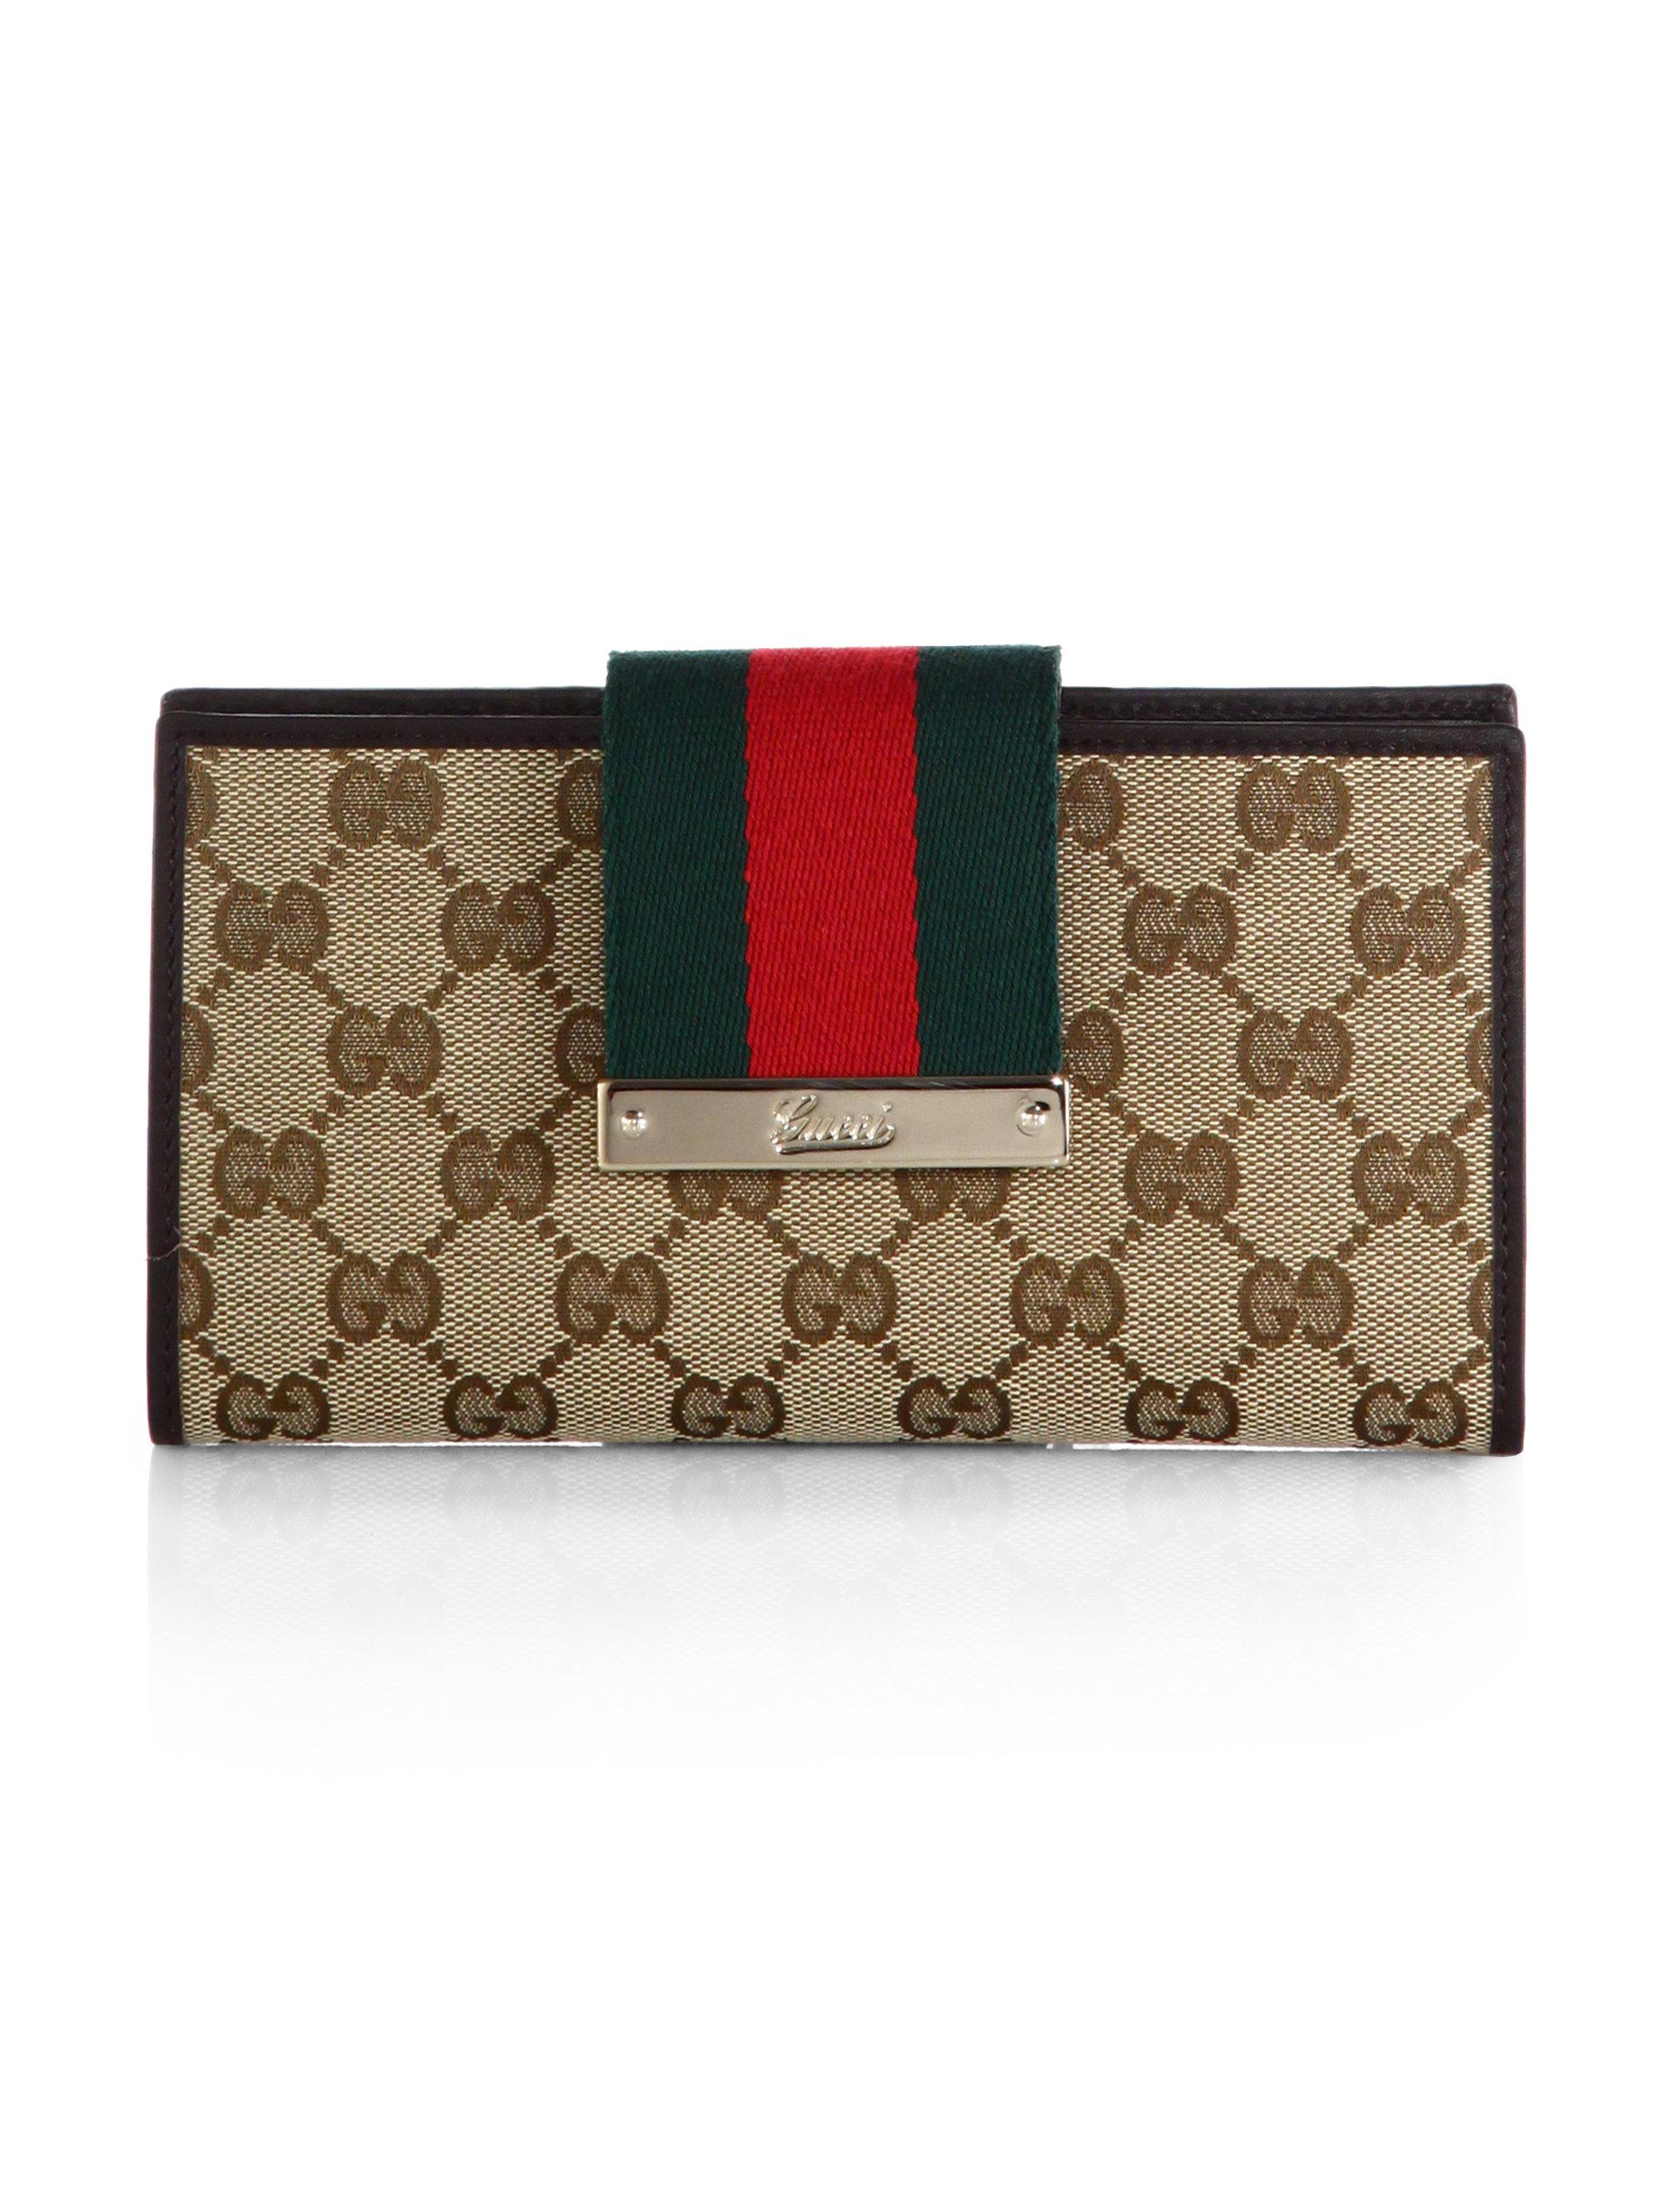 34e4b4b18eaa Gucci Ladies Web Original Gg Canvas Continental Wallet in Green - Lyst